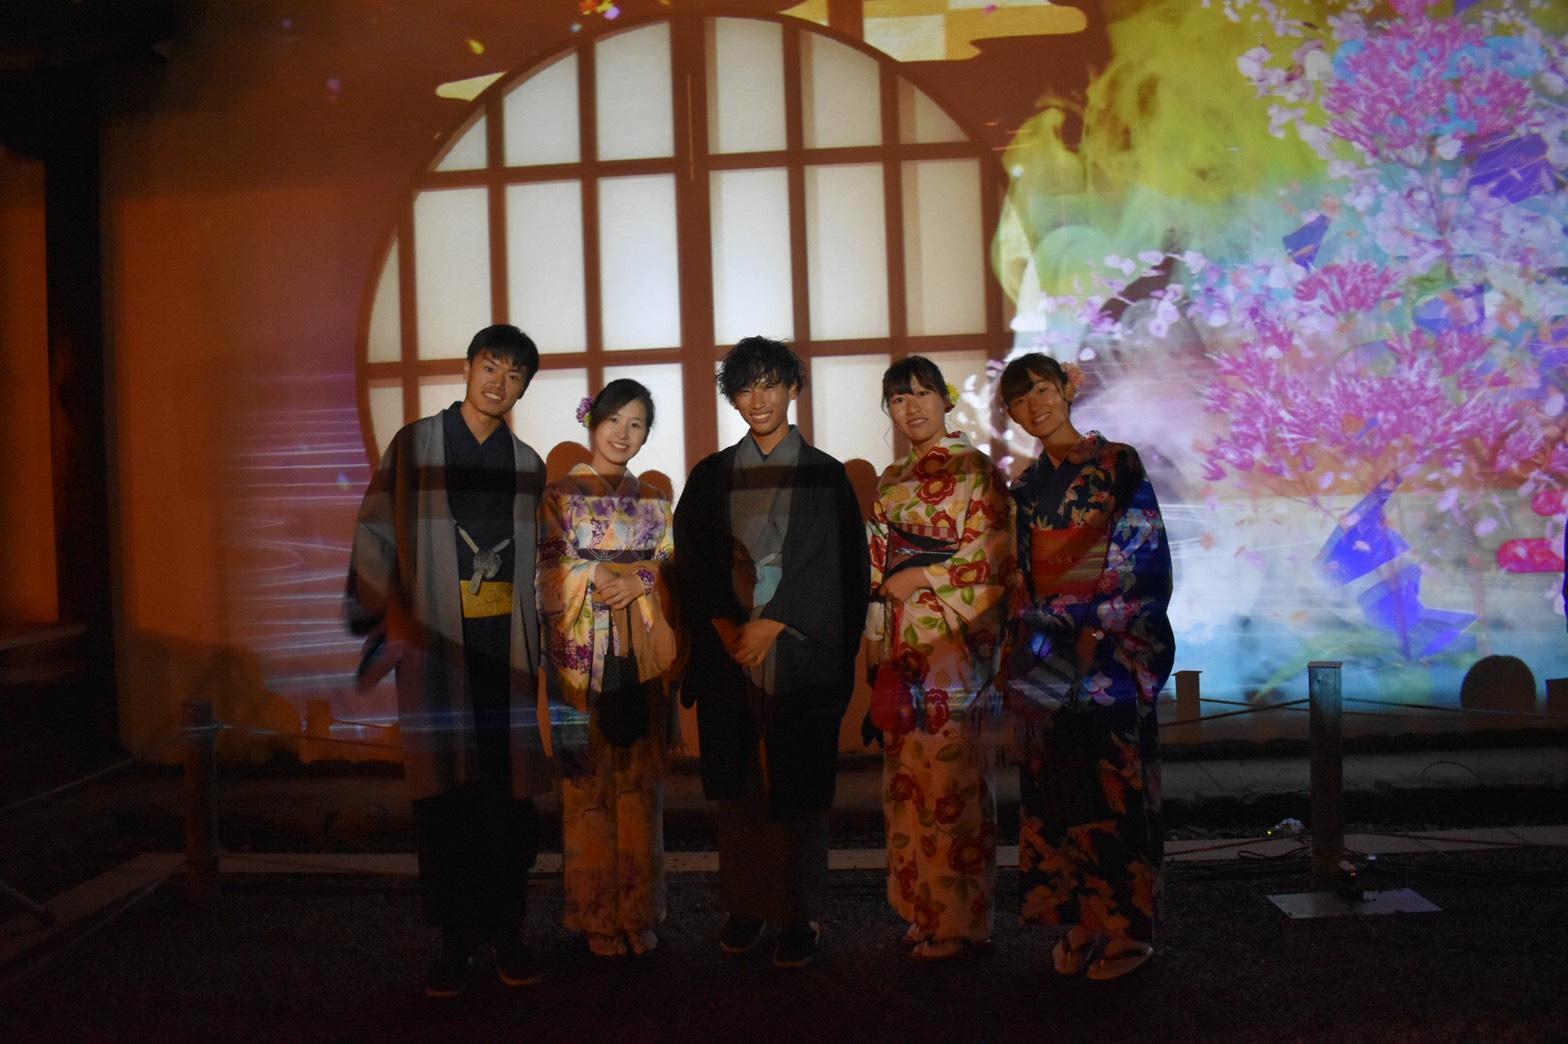 FLOWERS BY NAKED 2019 京都・二条城 大人気2019年11月17日11